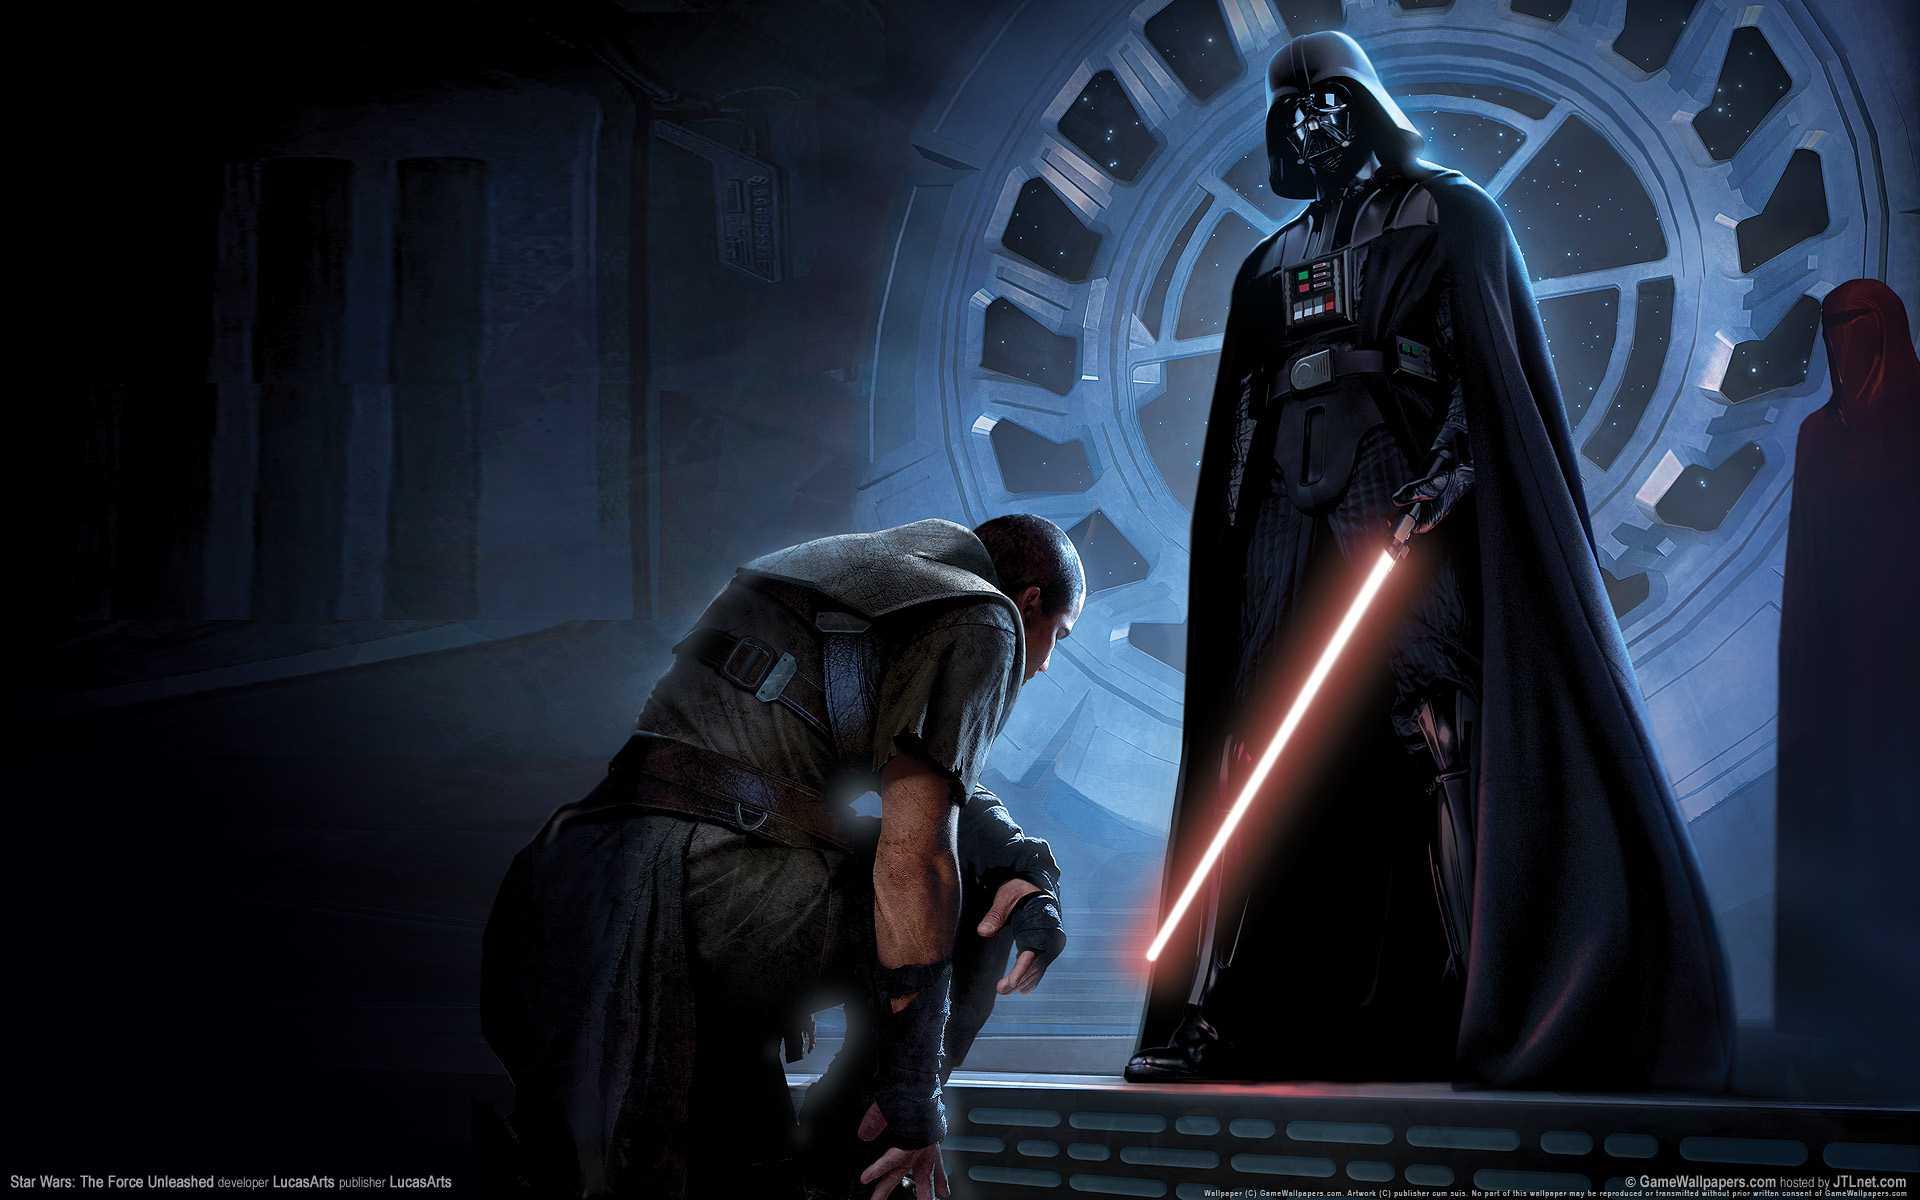 Anakin Skywalker Darth Vader Wallpaper Posted By John Cunningham